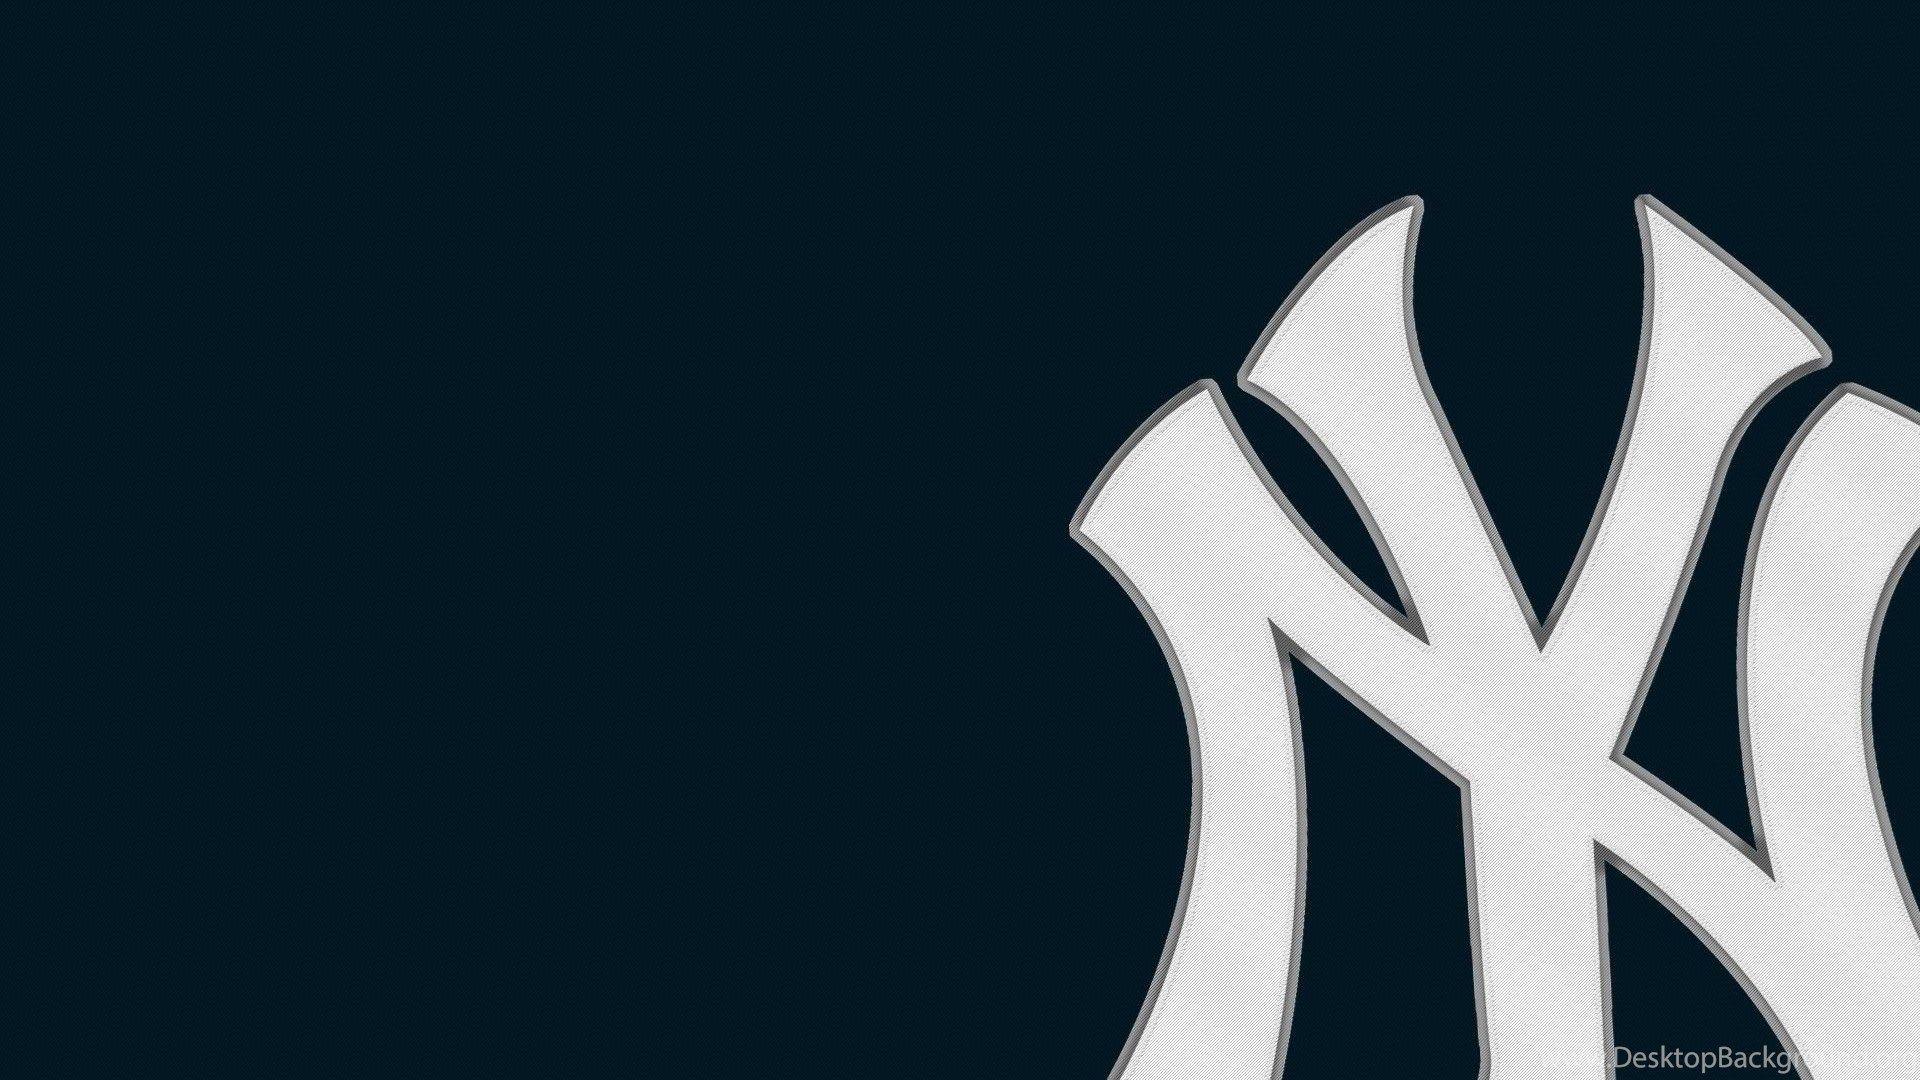 New York Yankees background wallpaper